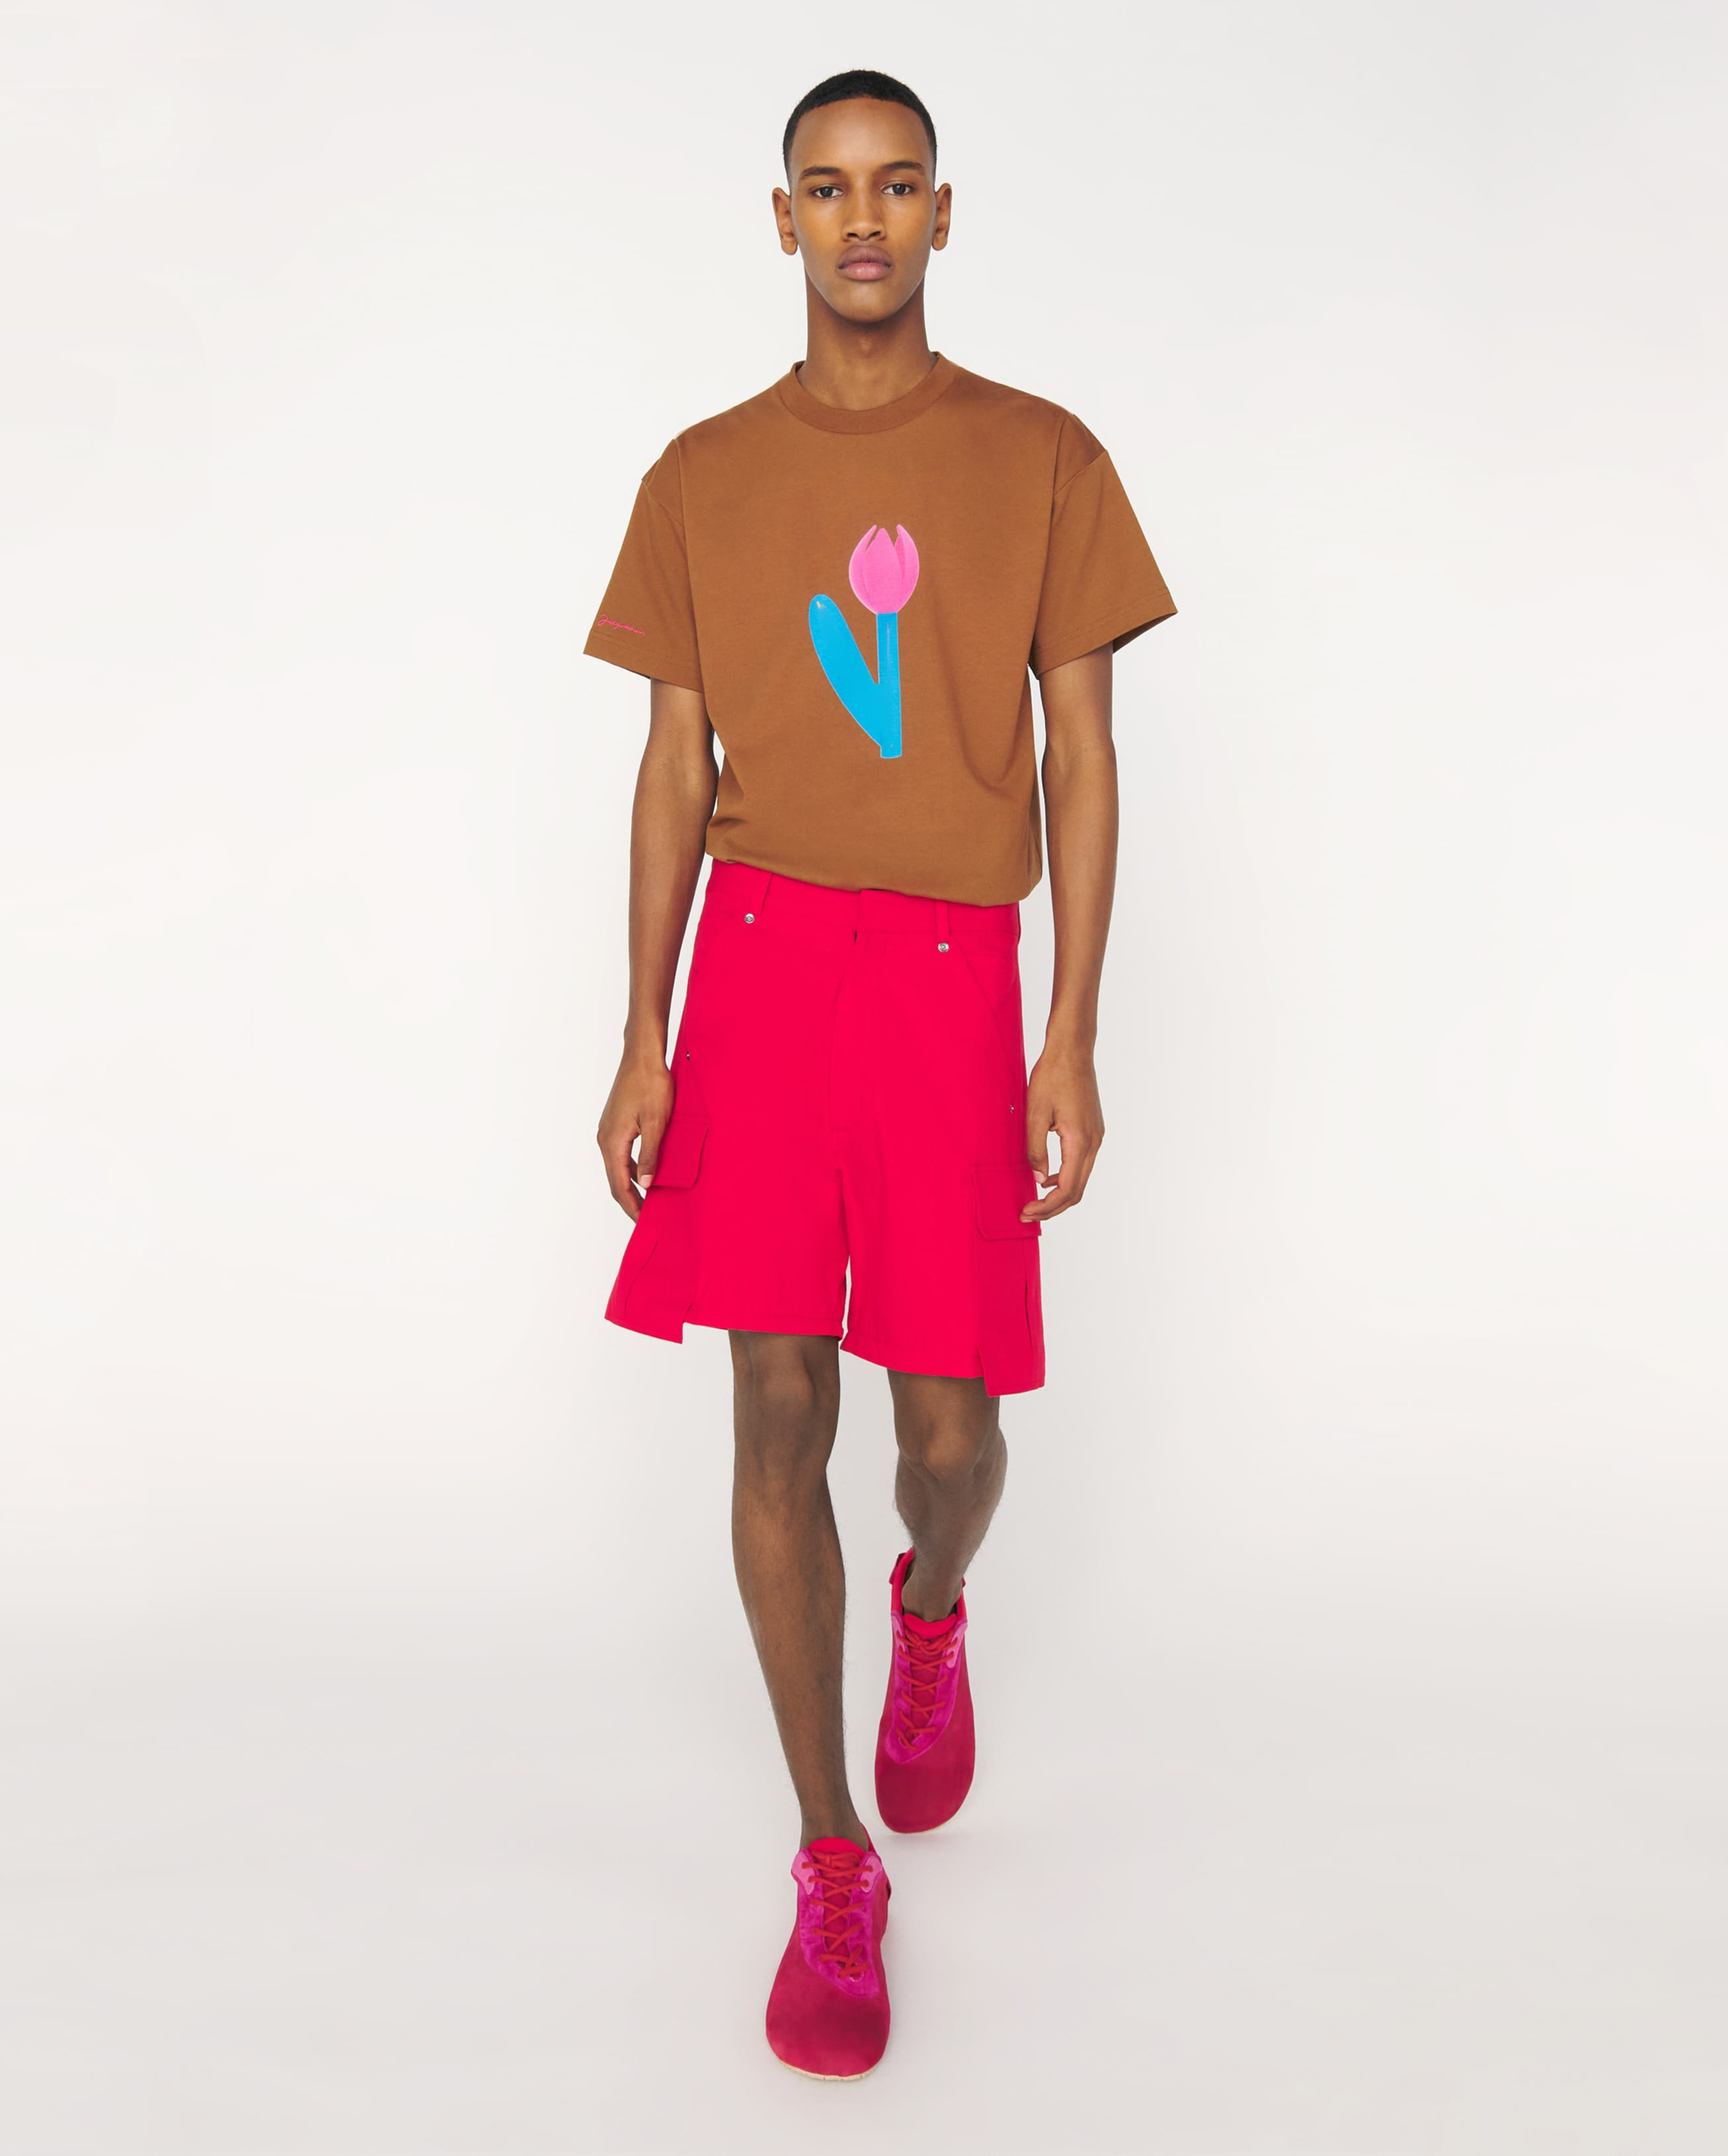 Le t-shirt Esca